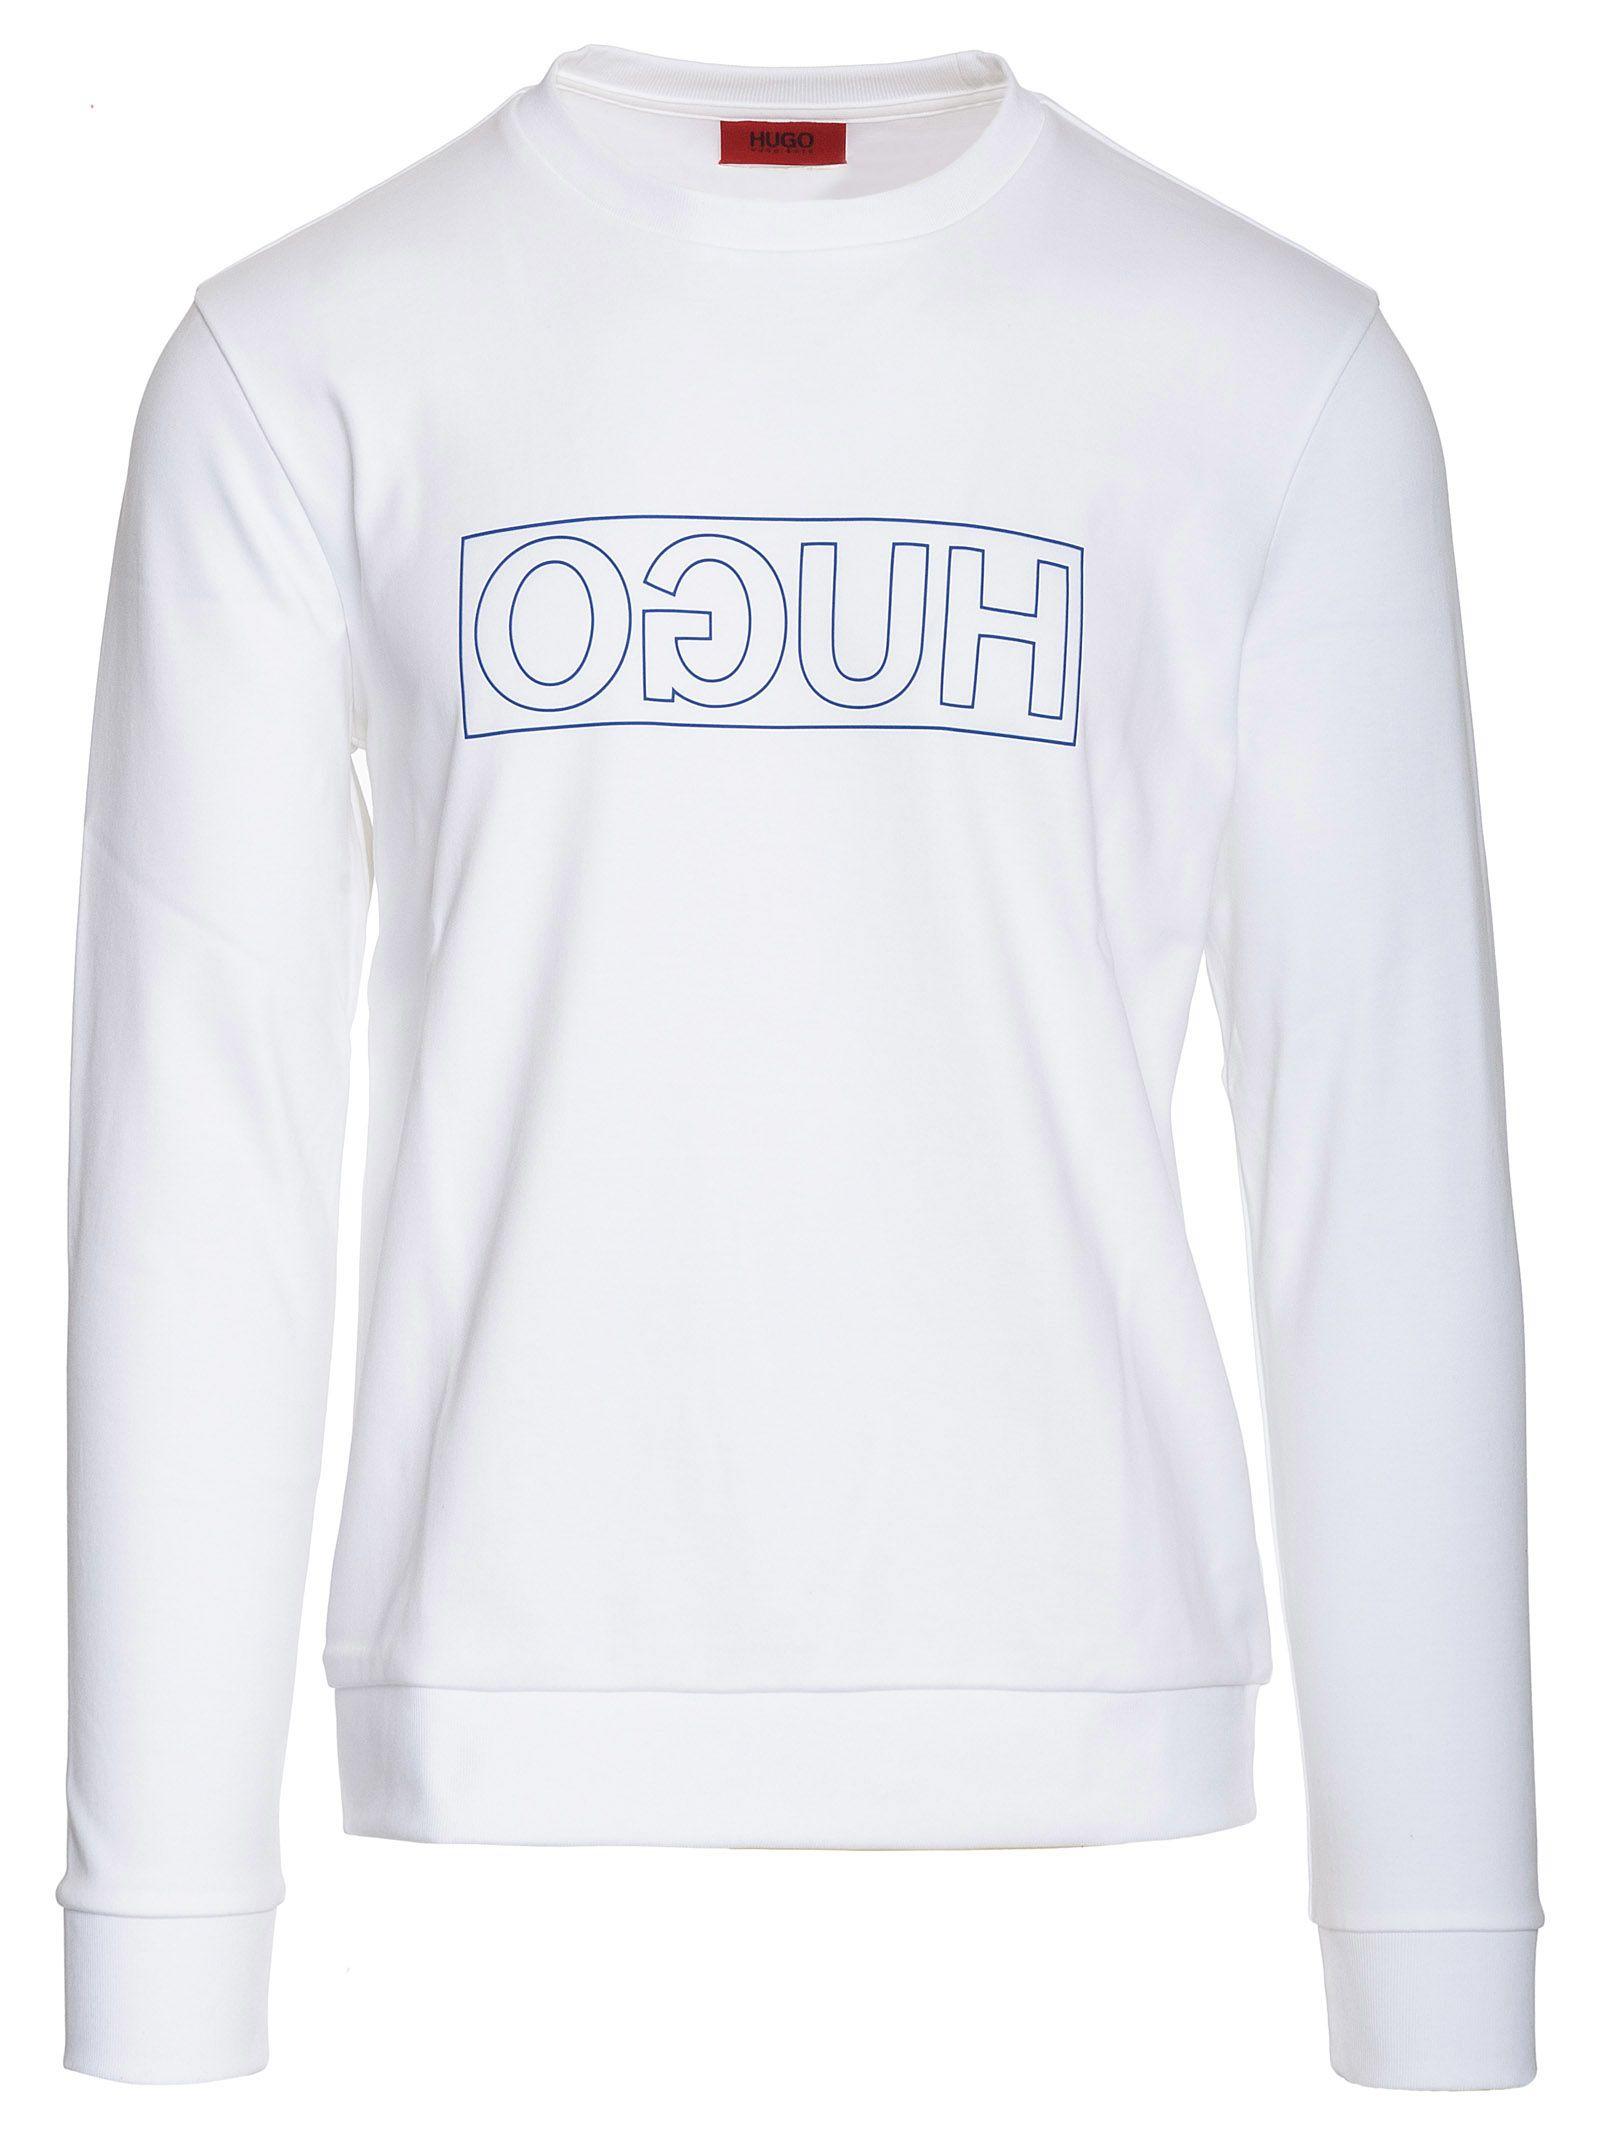 17e78a9bb Hugo Boss Hugo Dicago-u6 Sweatshirt - White - 10825270 | italist